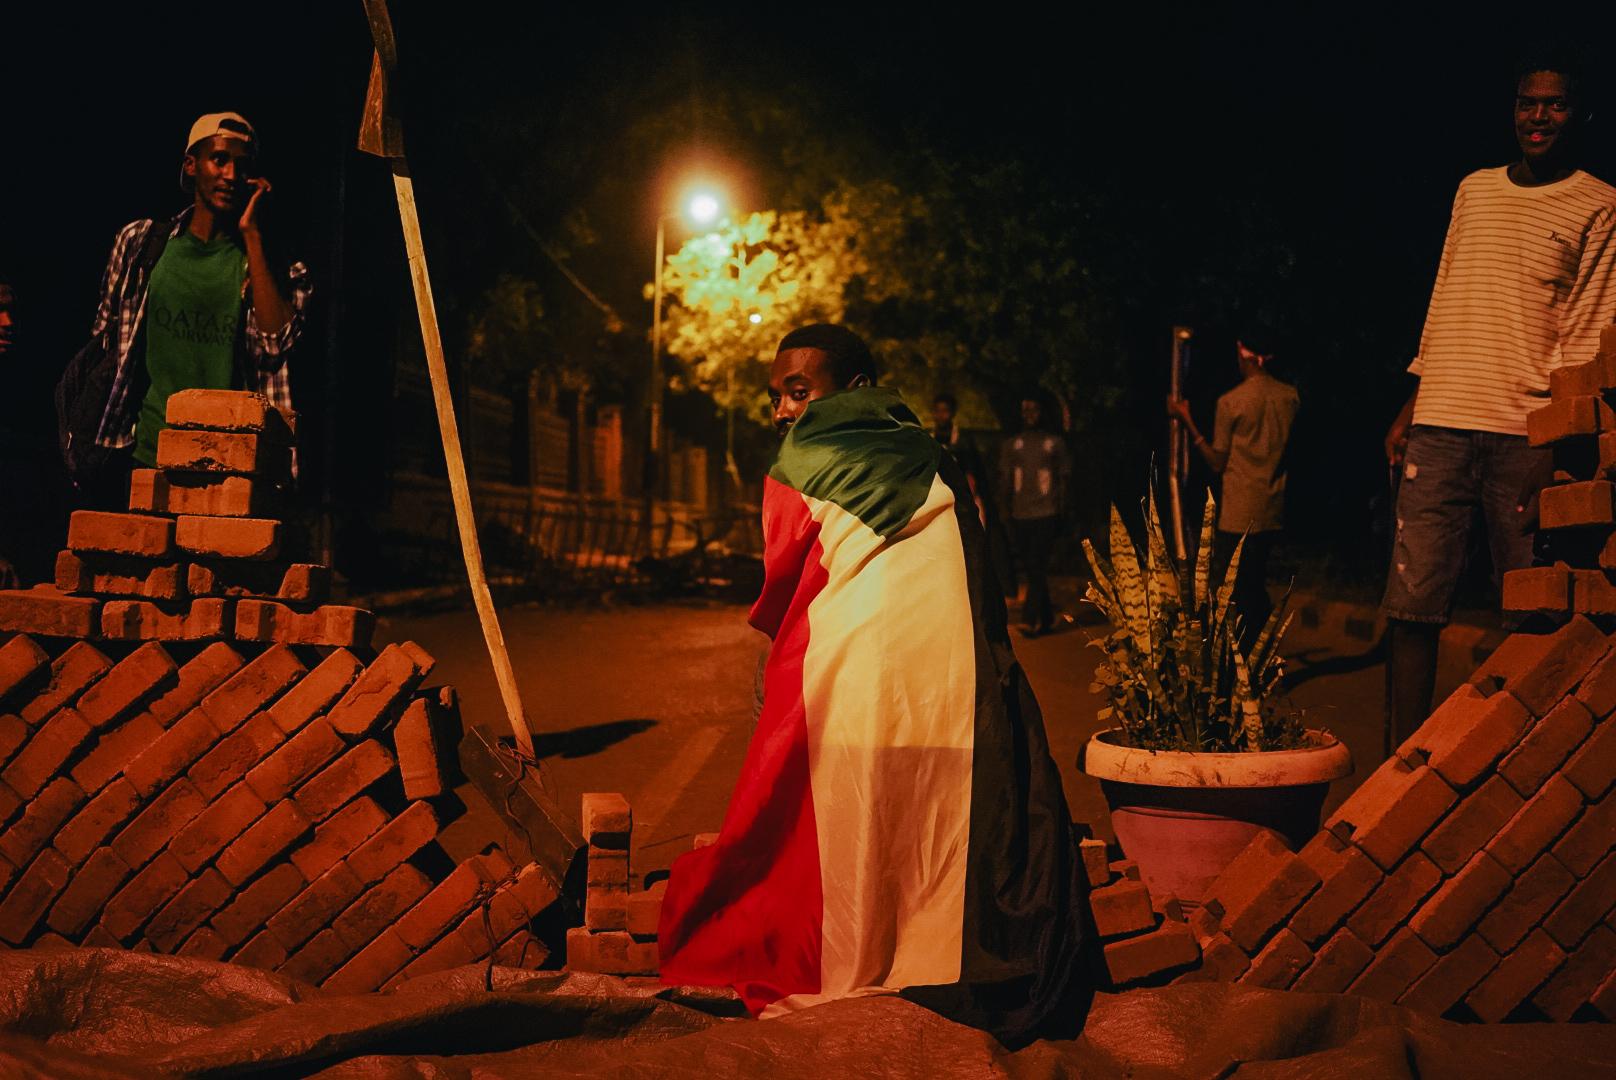 Sudanese protesters: Forces kill 1 outside Khartoum's sit